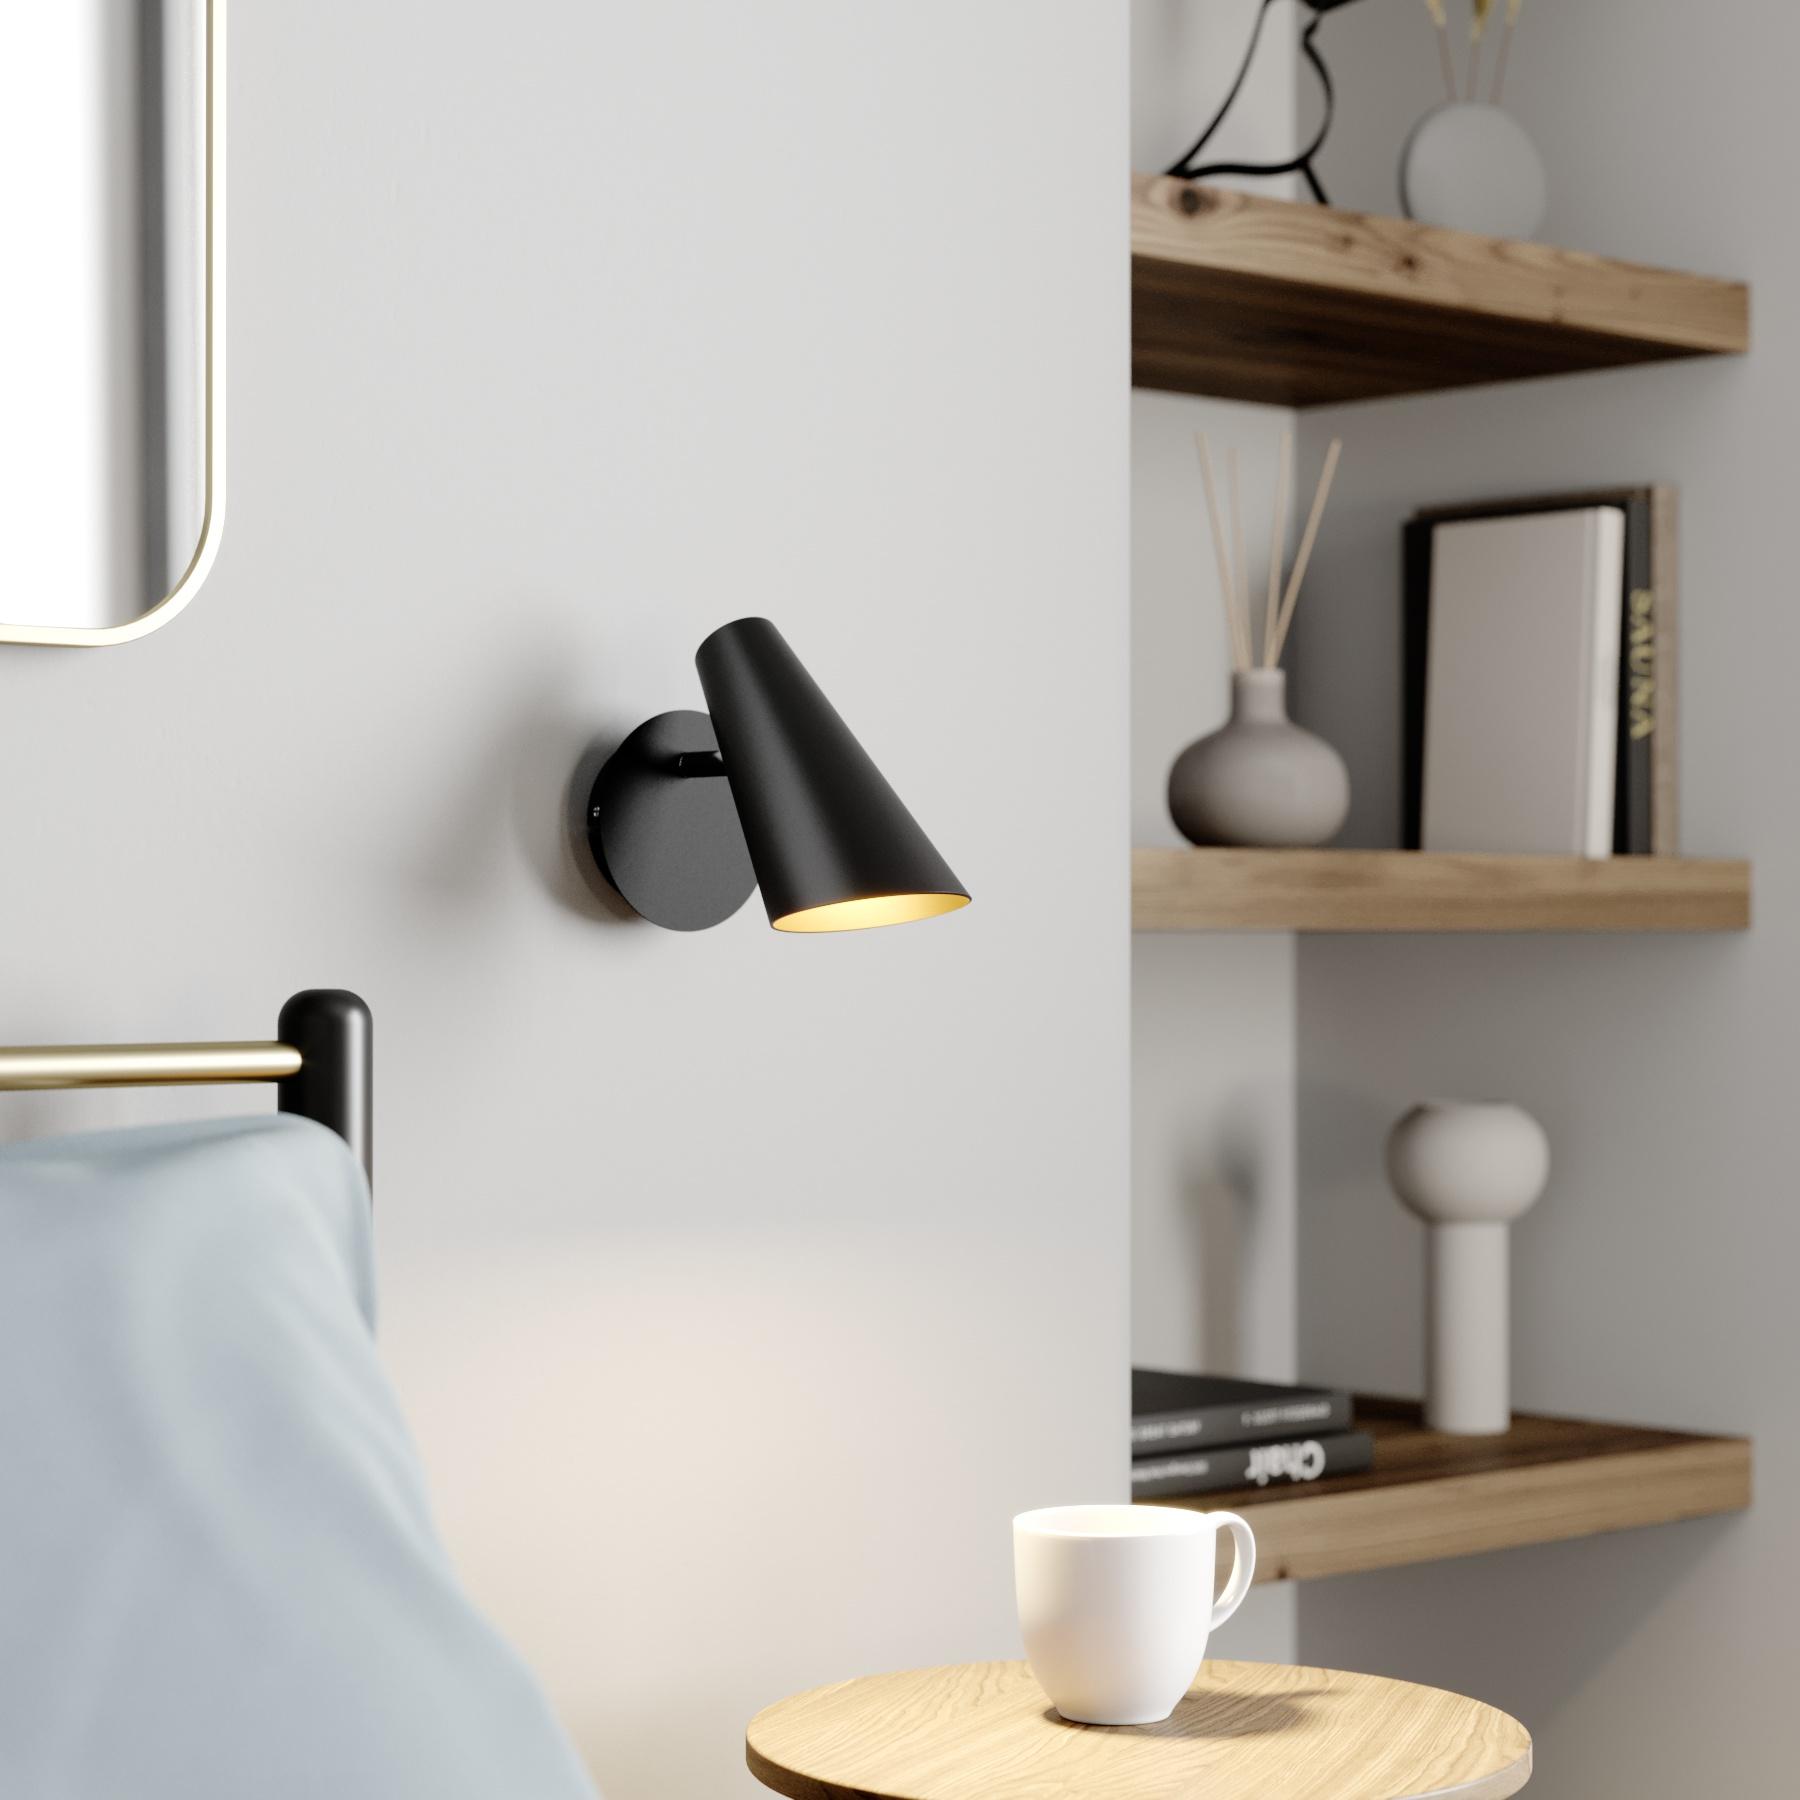 Lucande Wibke wandlamp in het zwart